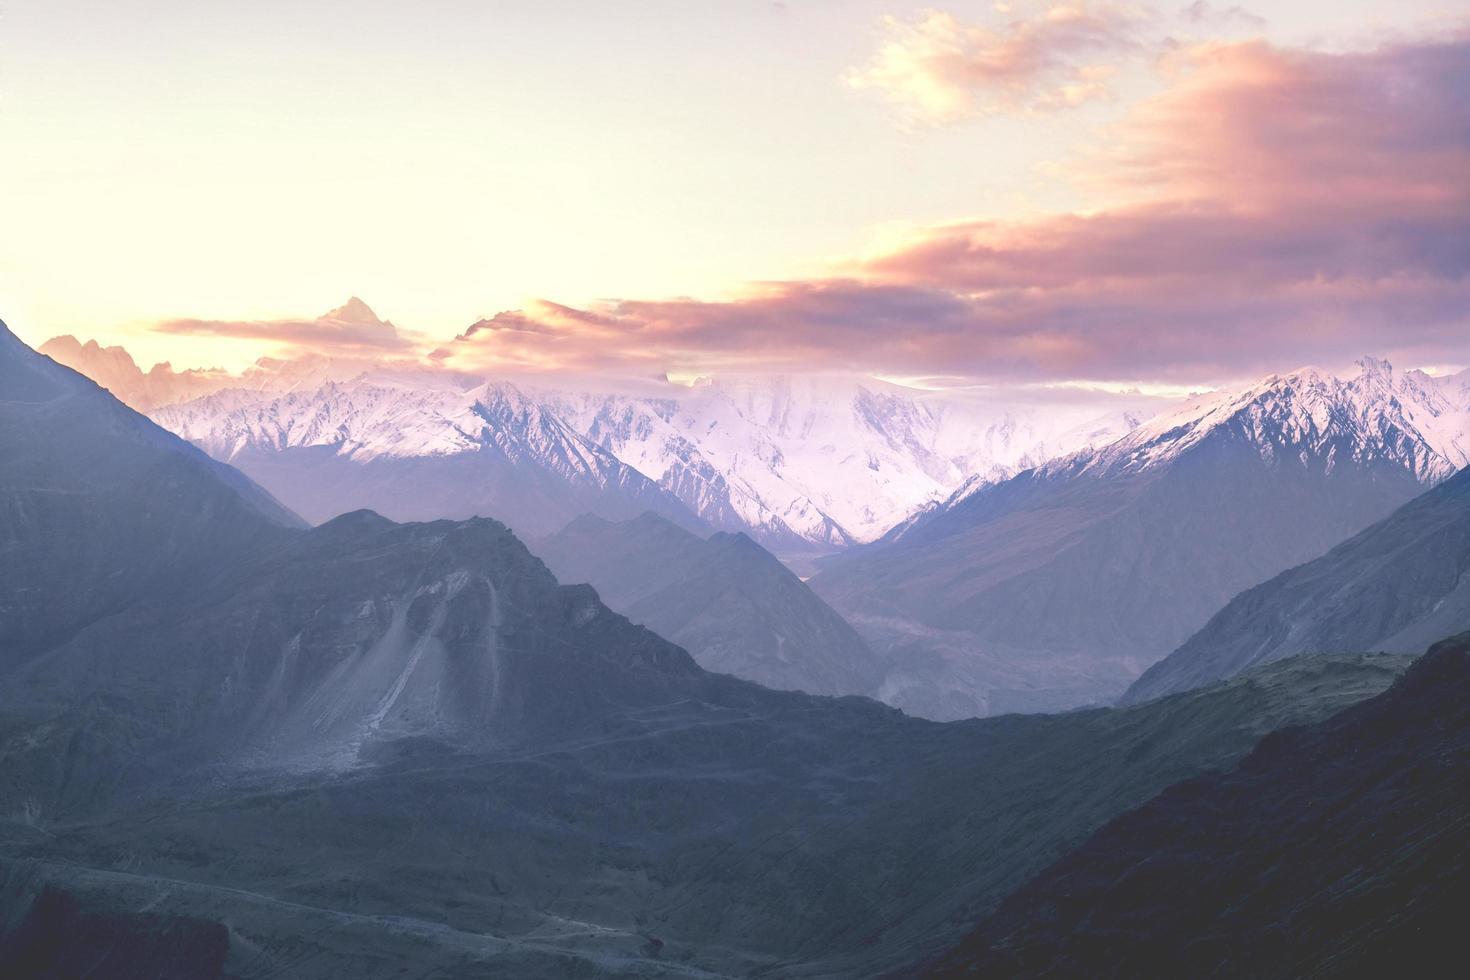 Sunrise over snow capped Karakoram Mountain range photo